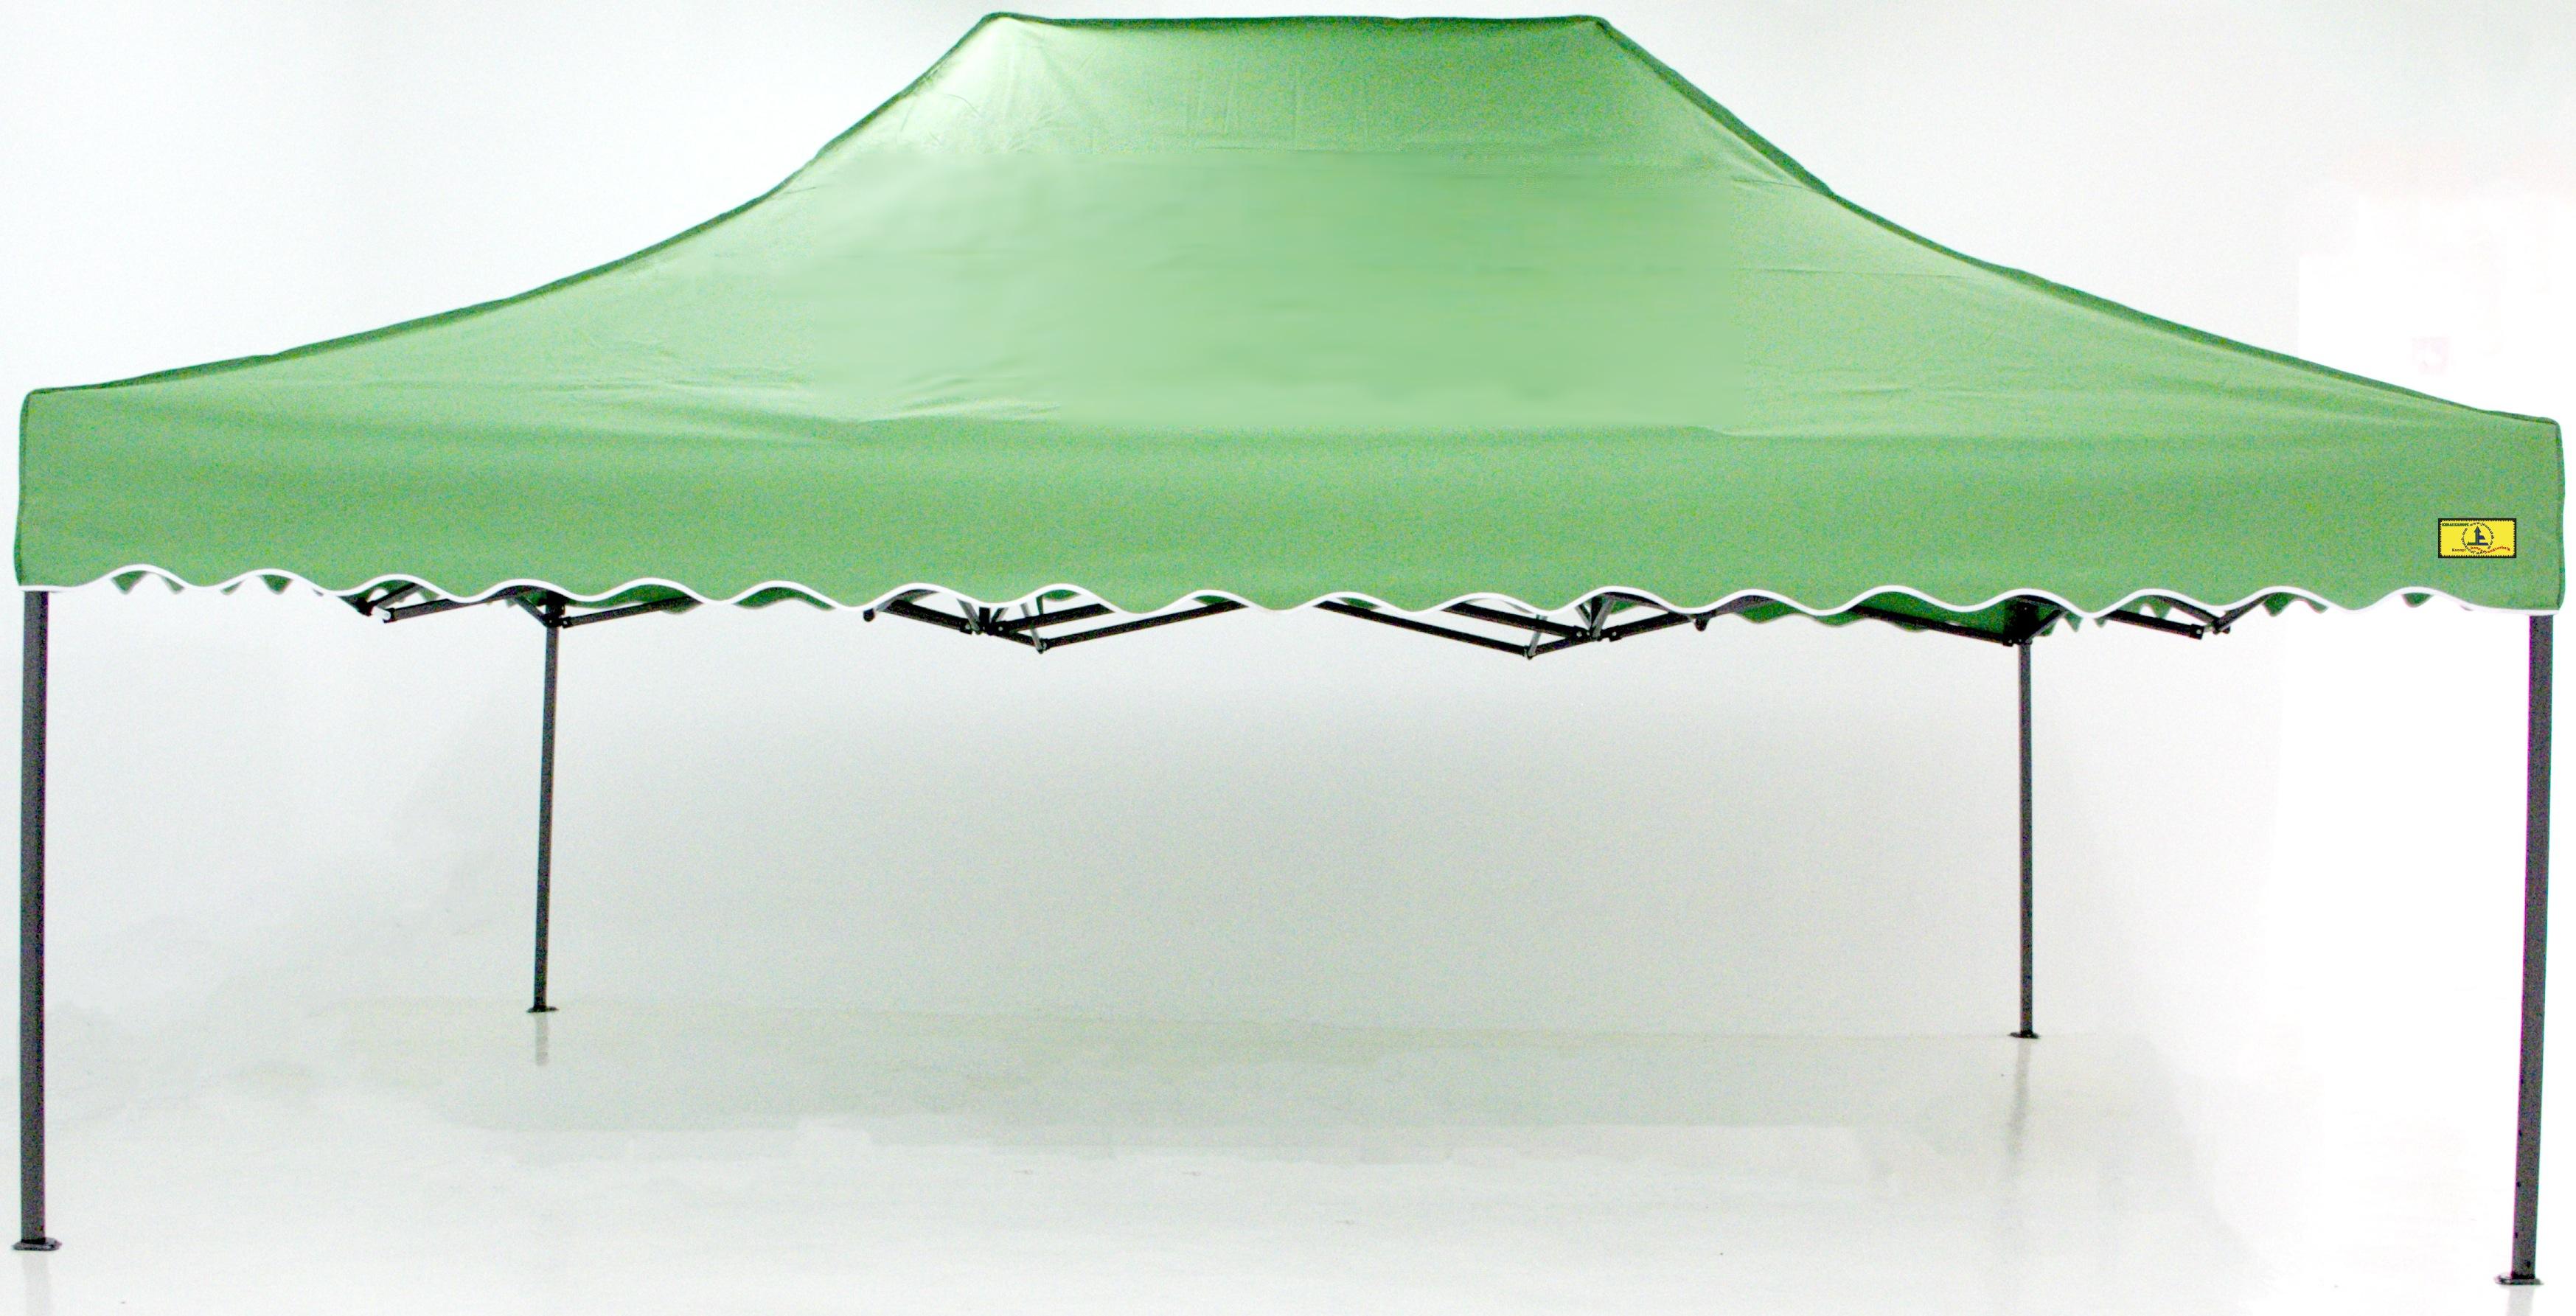 Canopy 3m x 4.5m Heavy Duty S & Product - JooEast